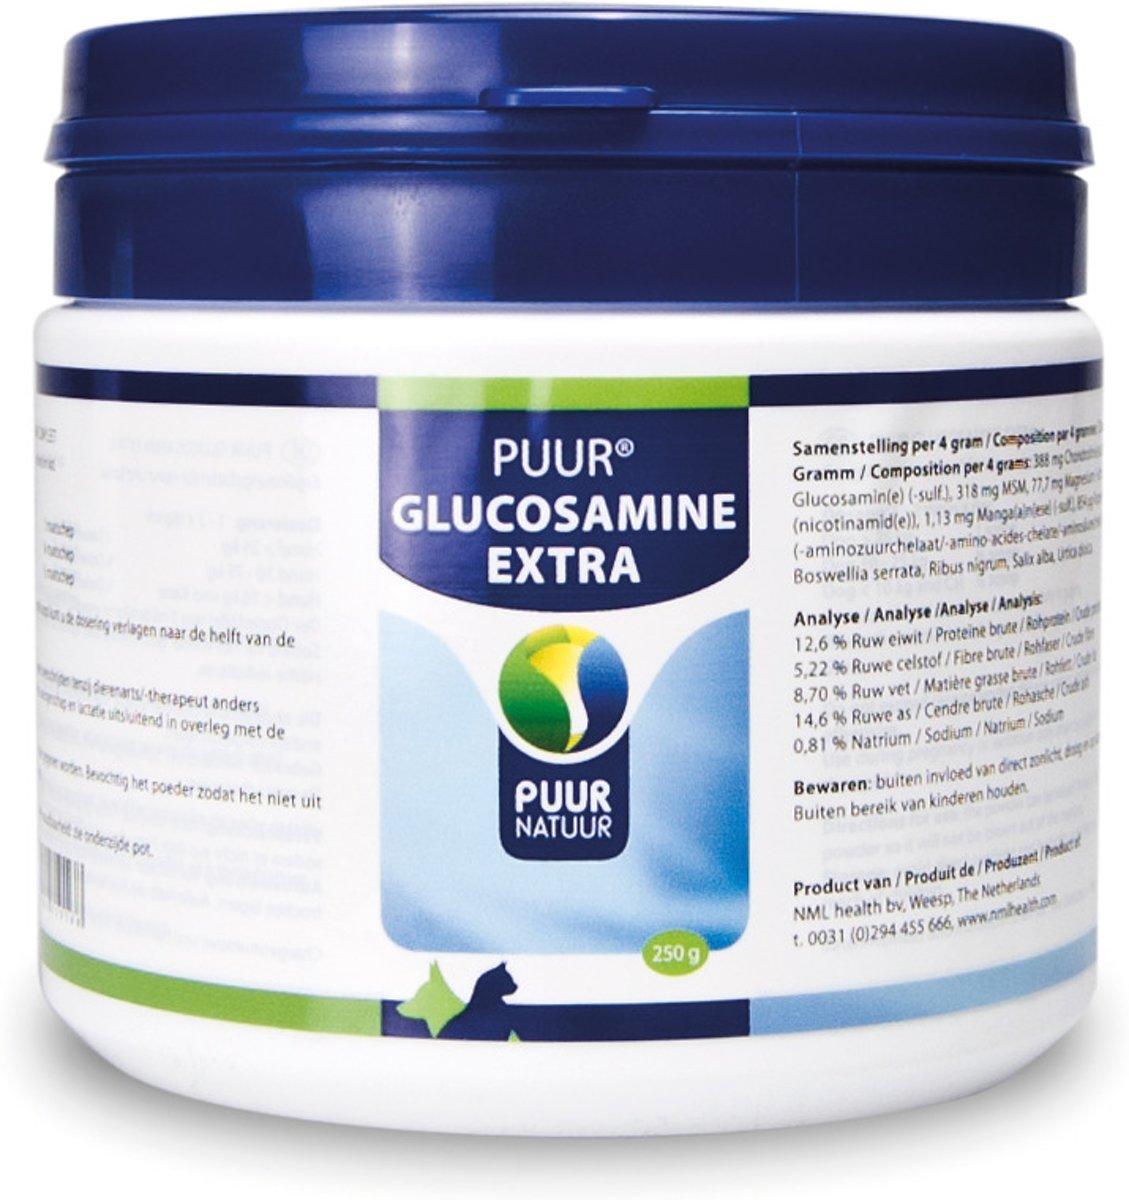 Puur Natuur Glucosamine Compleet - 250 gr